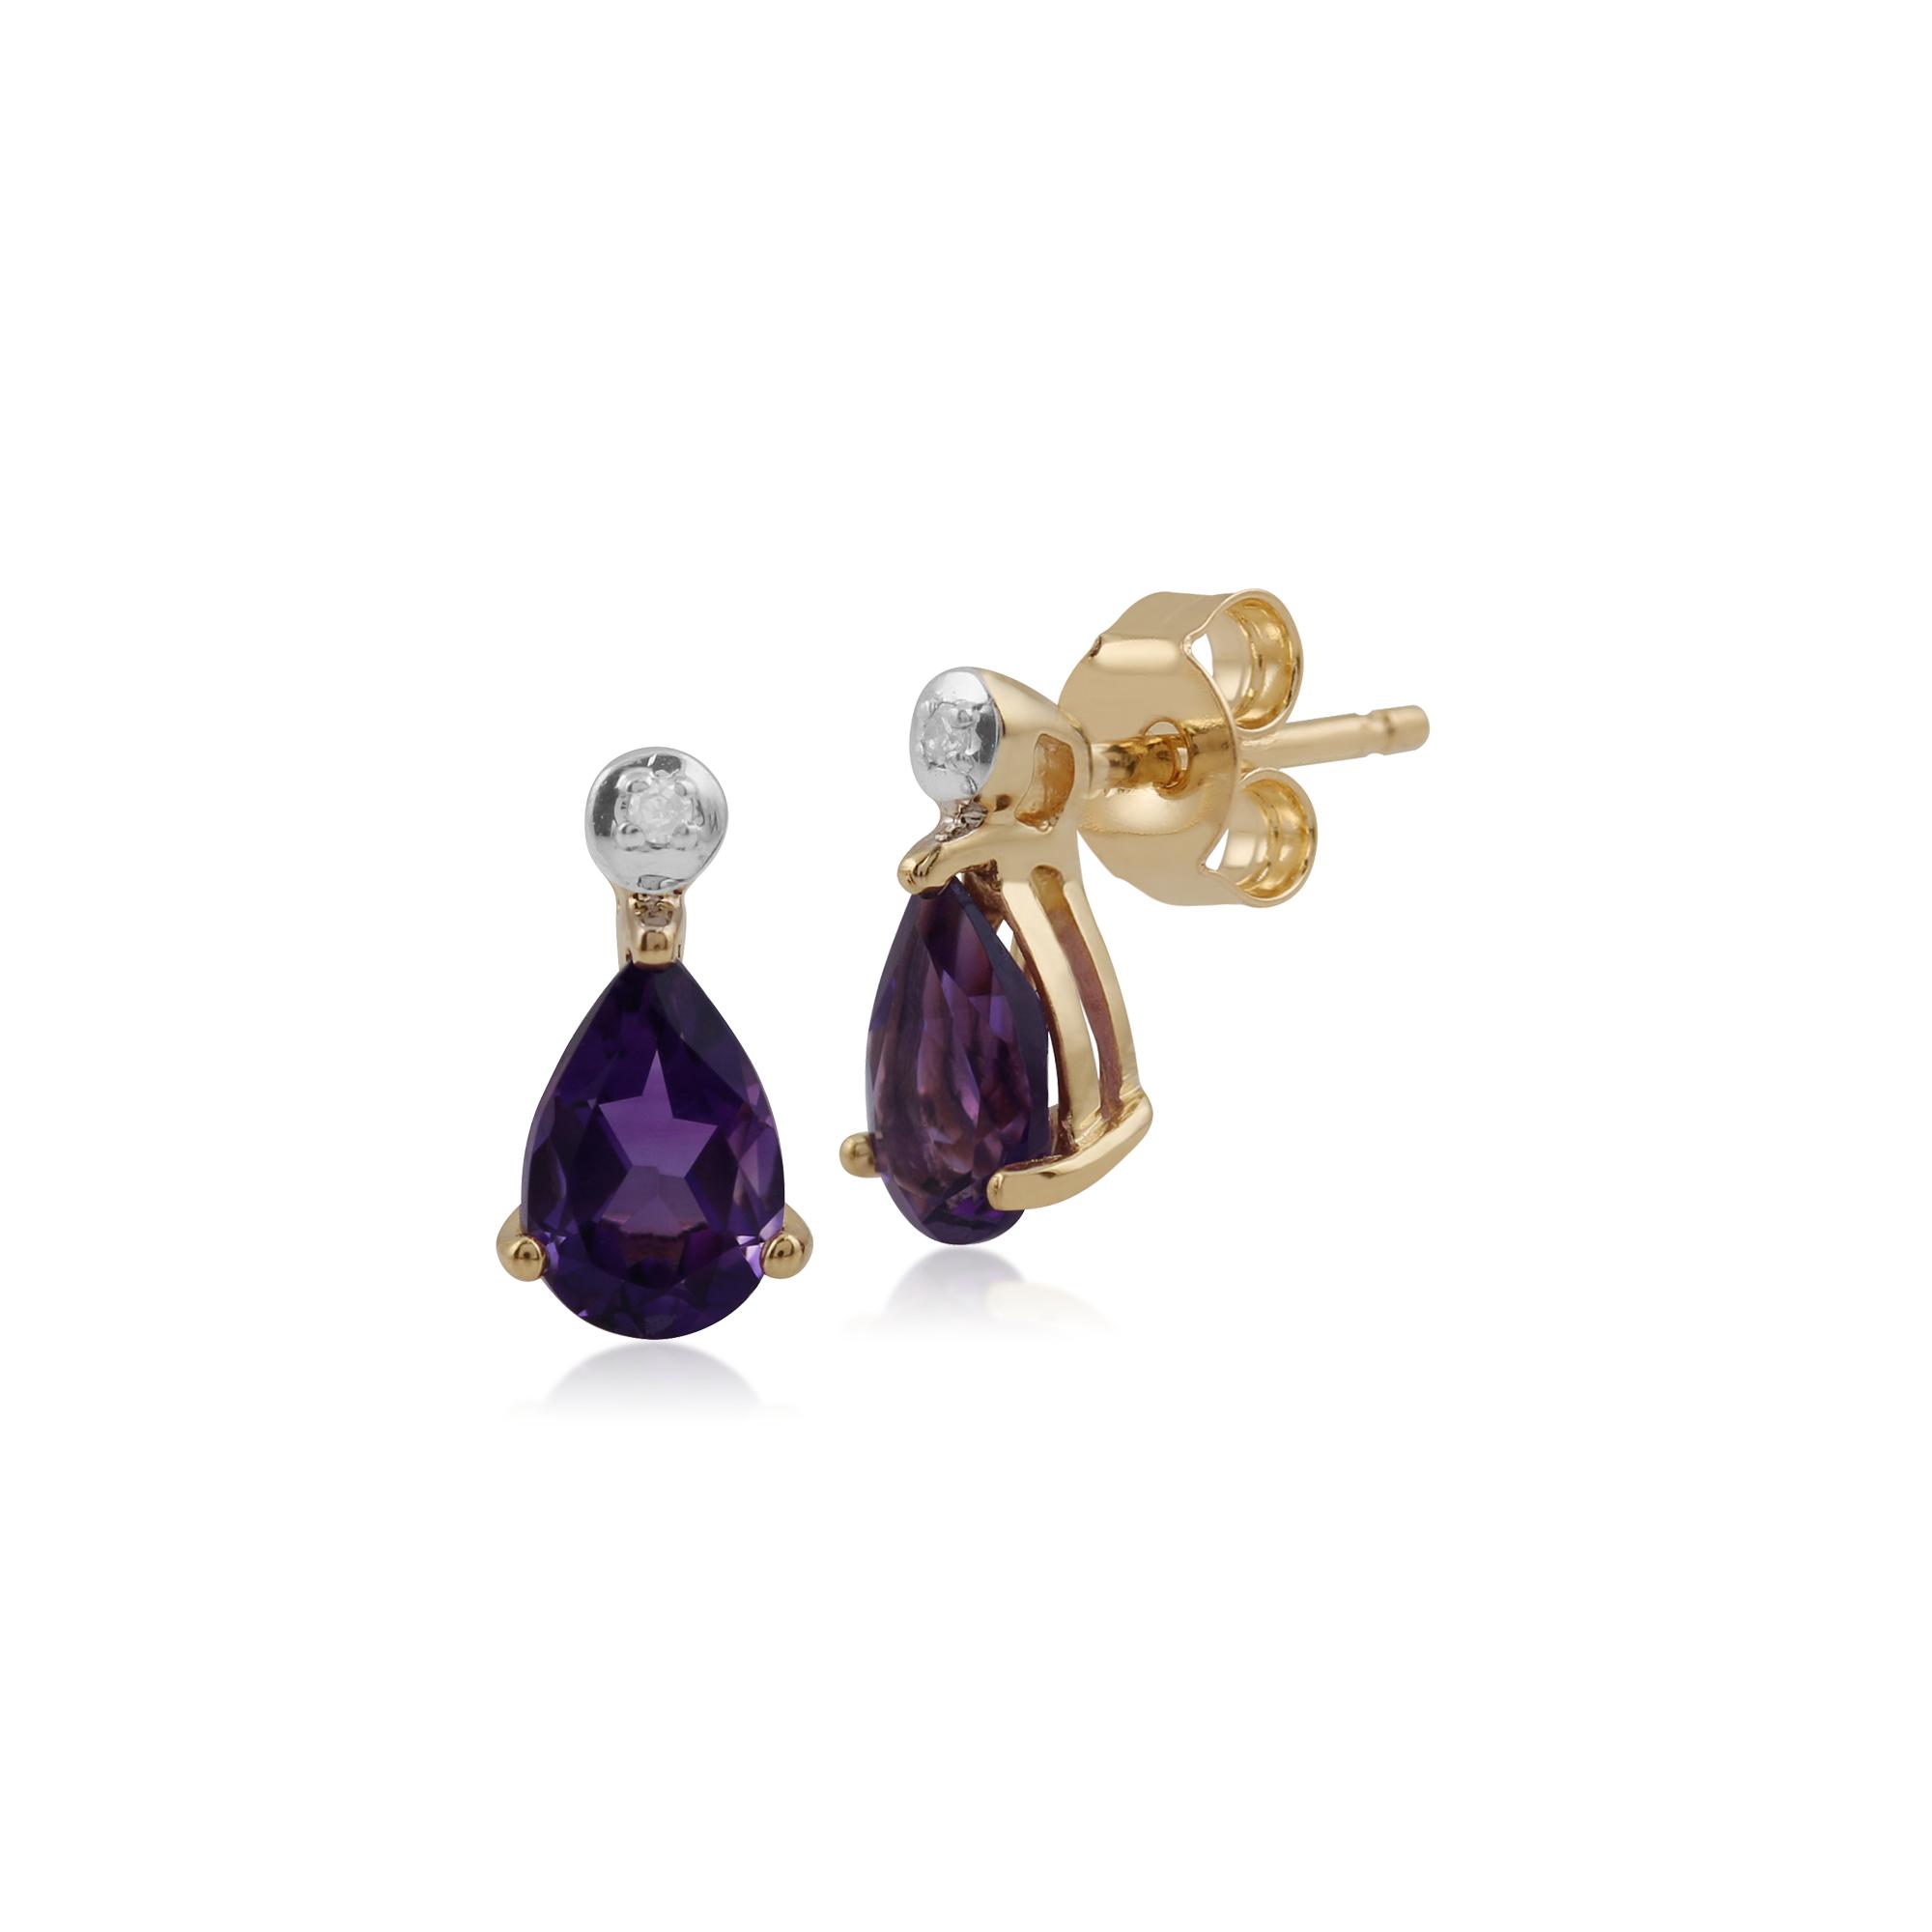 4061b3c25 Details about Gemondo 9ct Yellow Gold 0.72ct Amethyst & Diamond Pear Stud  Earrings